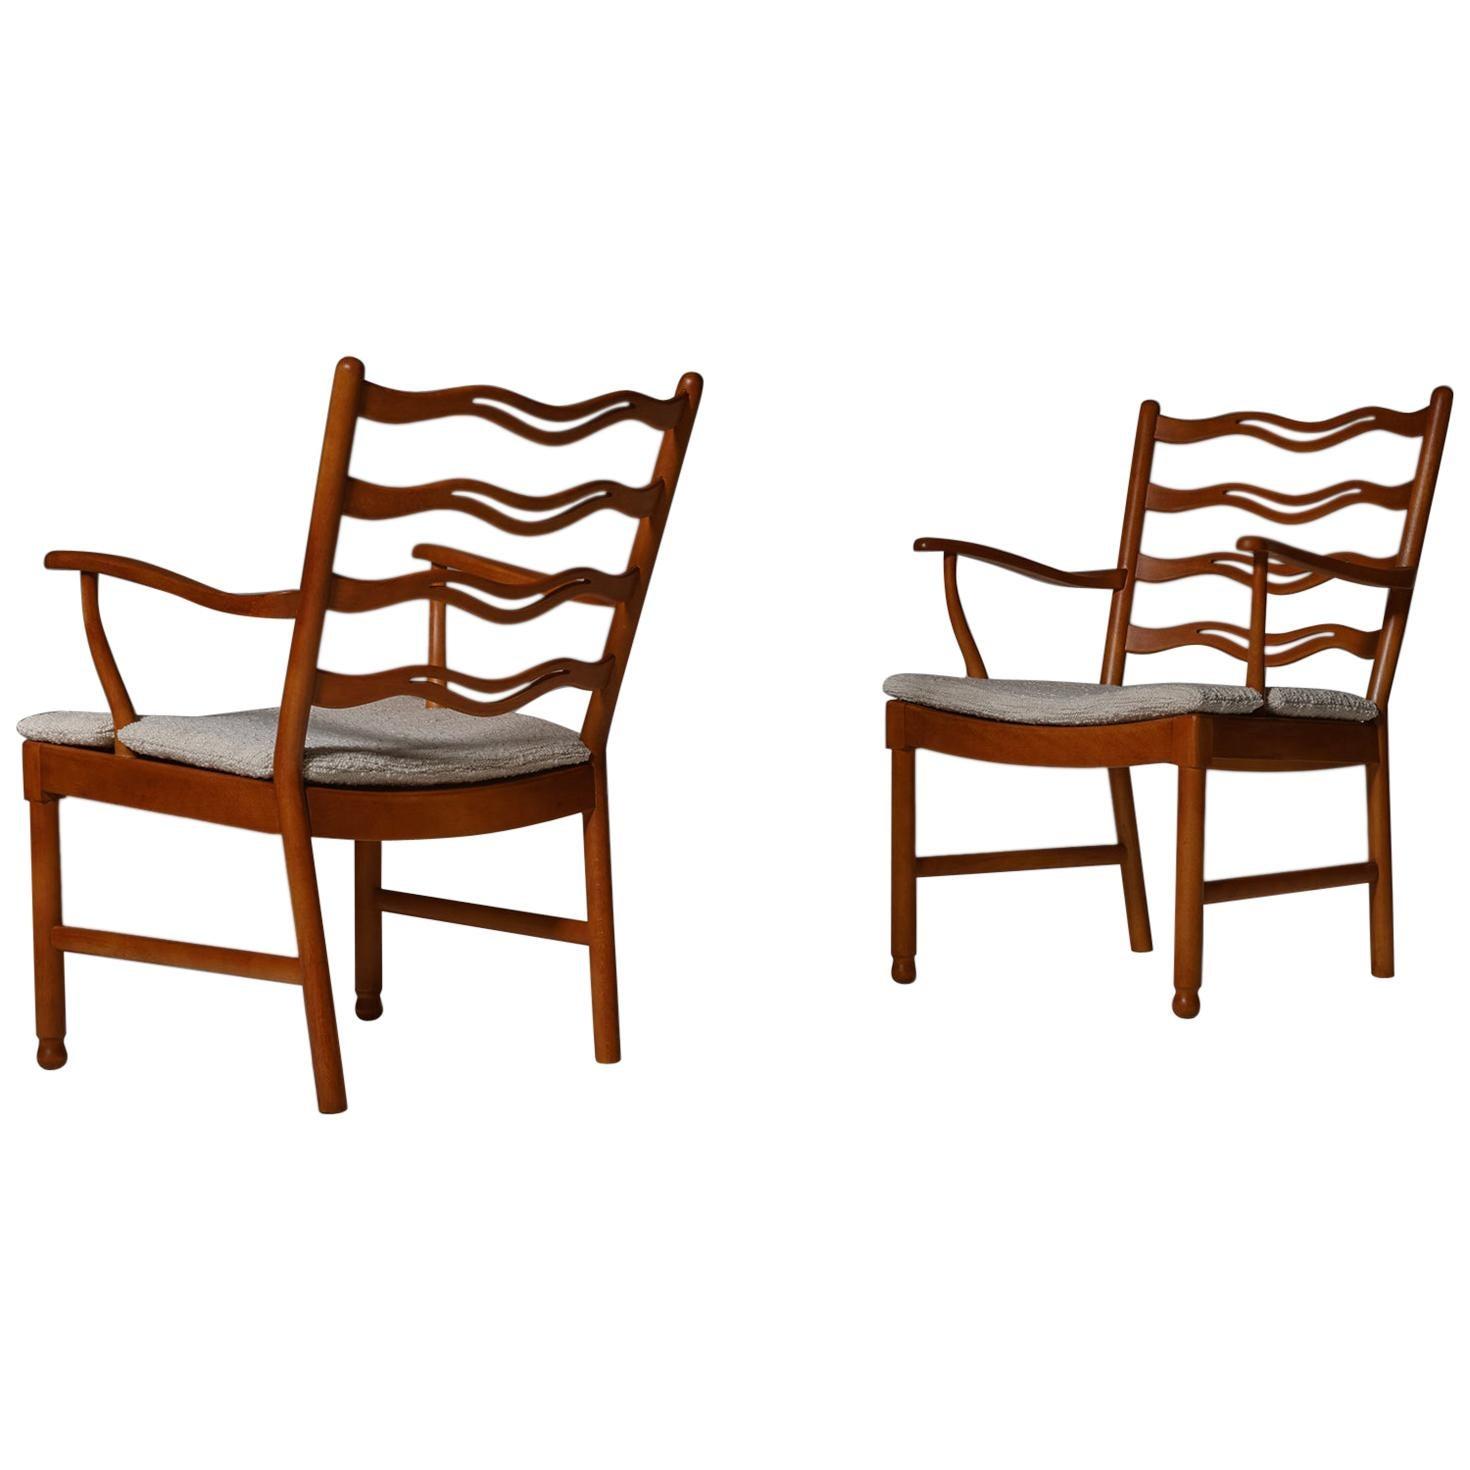 Ole Wanscher 'Model 1755' Armchairs for Fritz Hansen, Set of Two